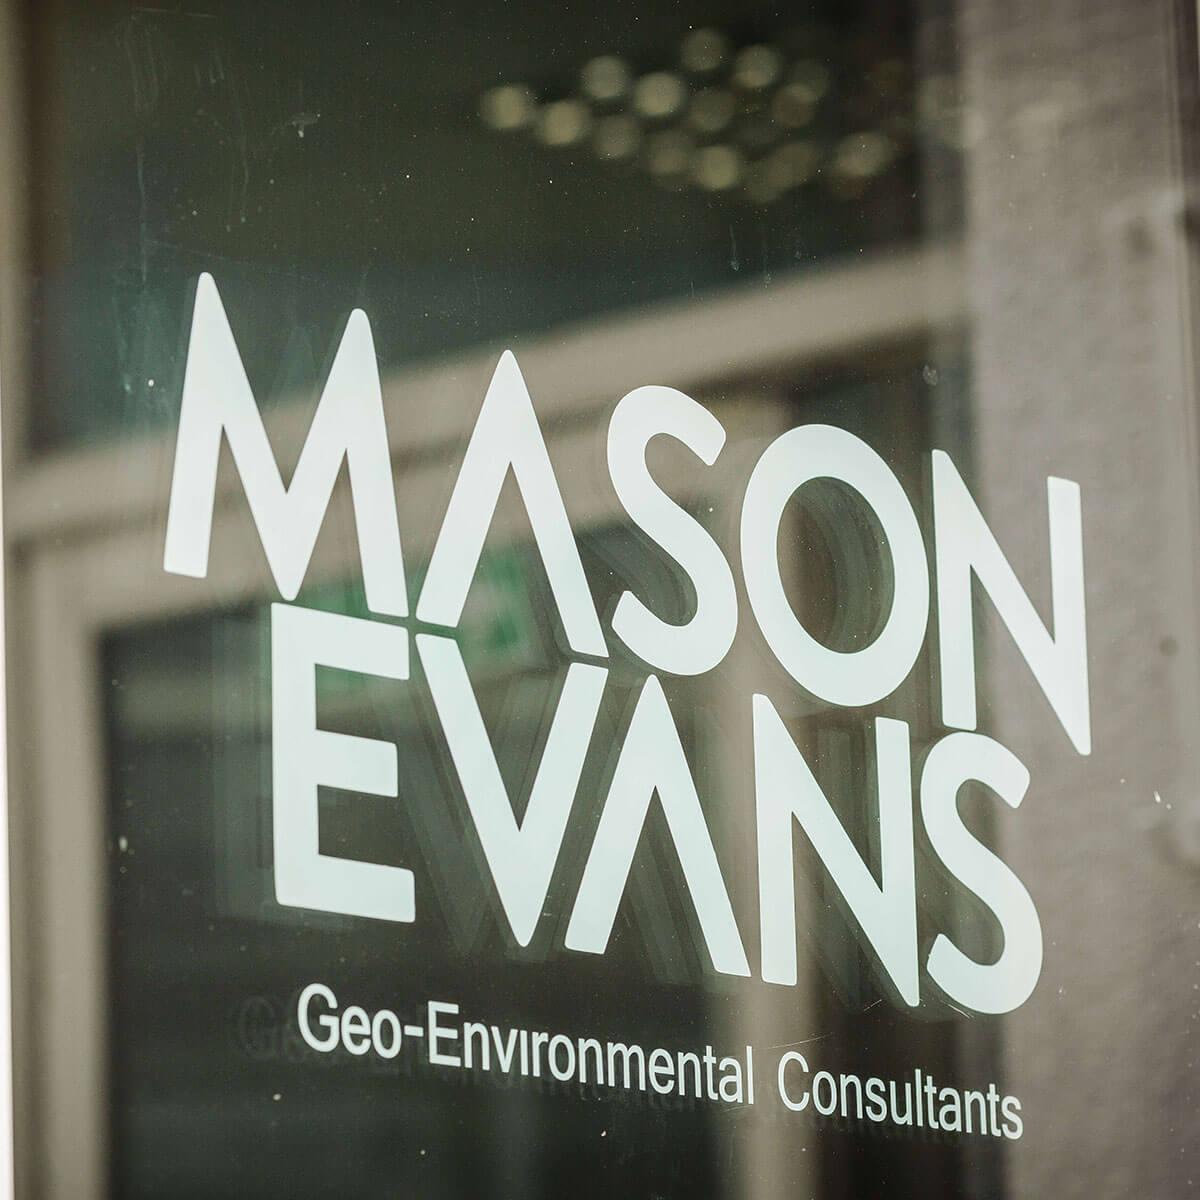 Mason Evans About Image